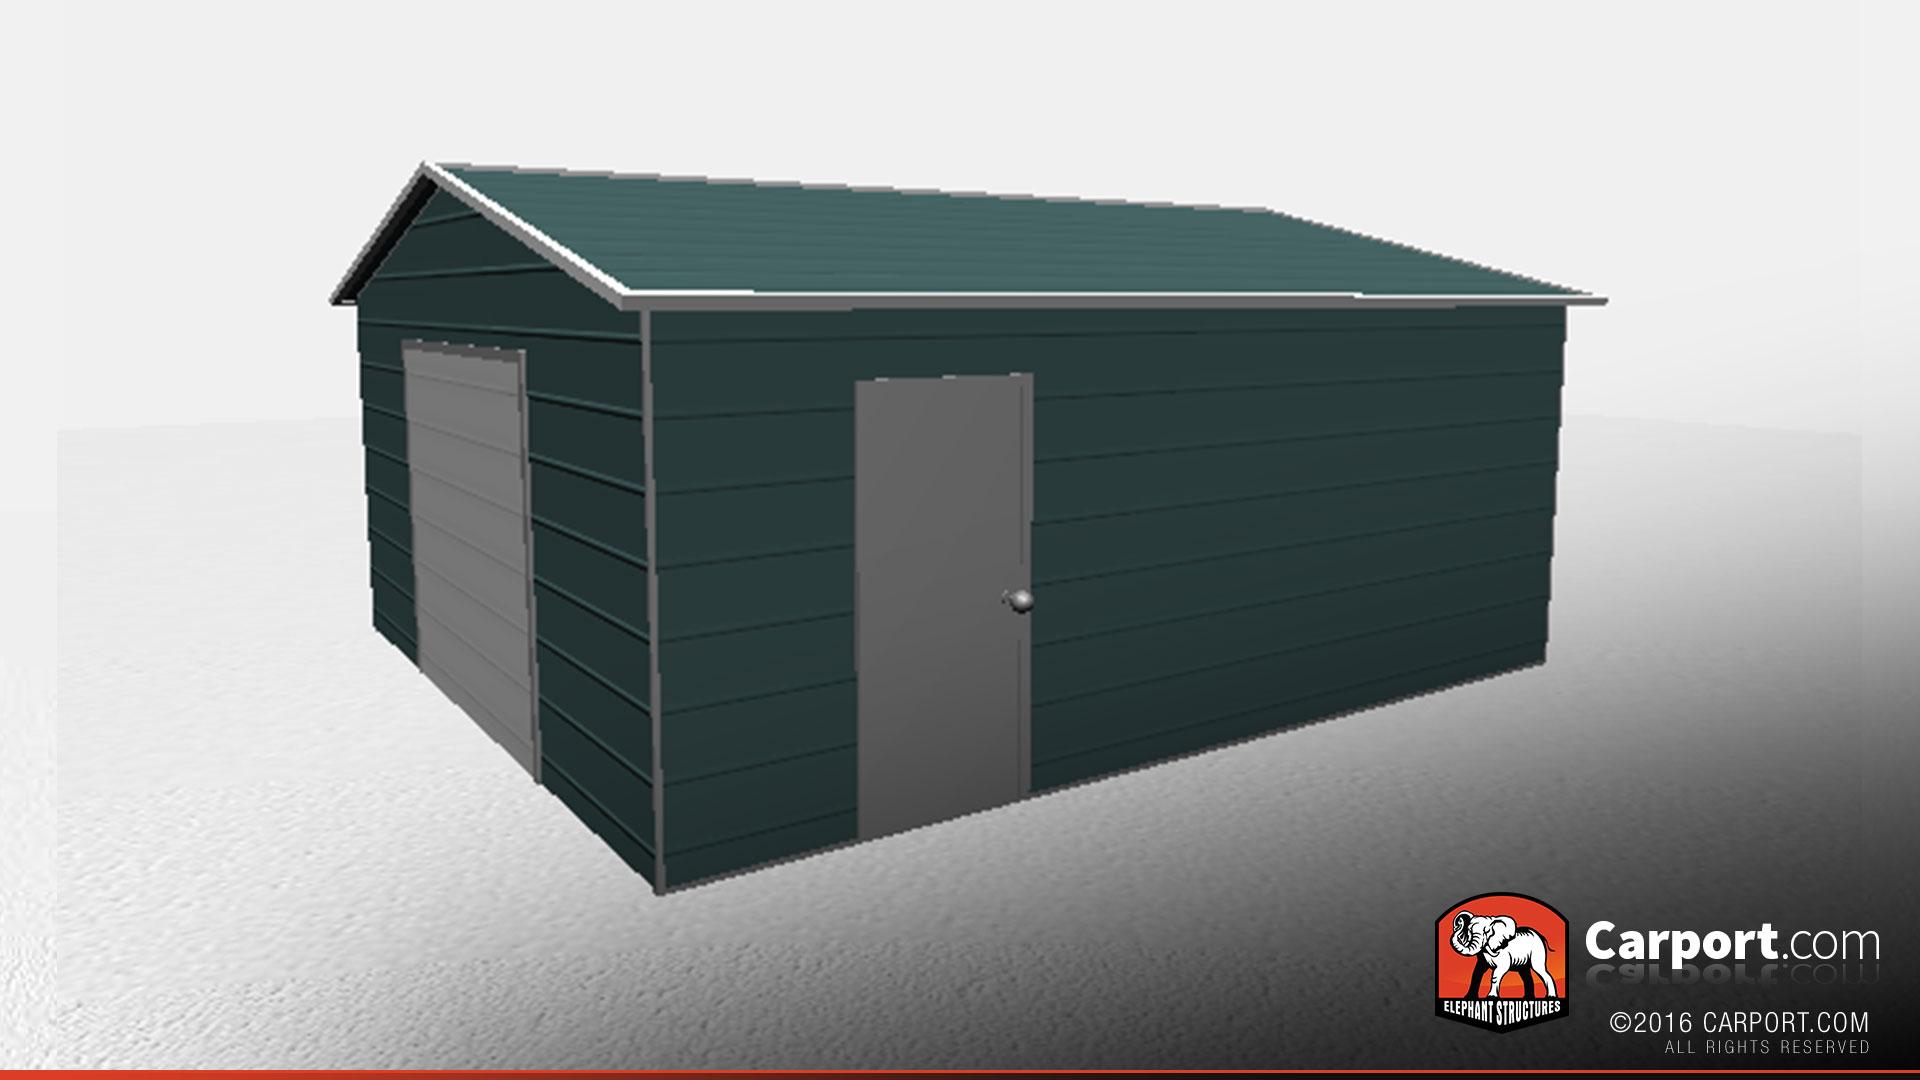 18 X 21 X 8 Fully Enclosed Metal Workshop Building